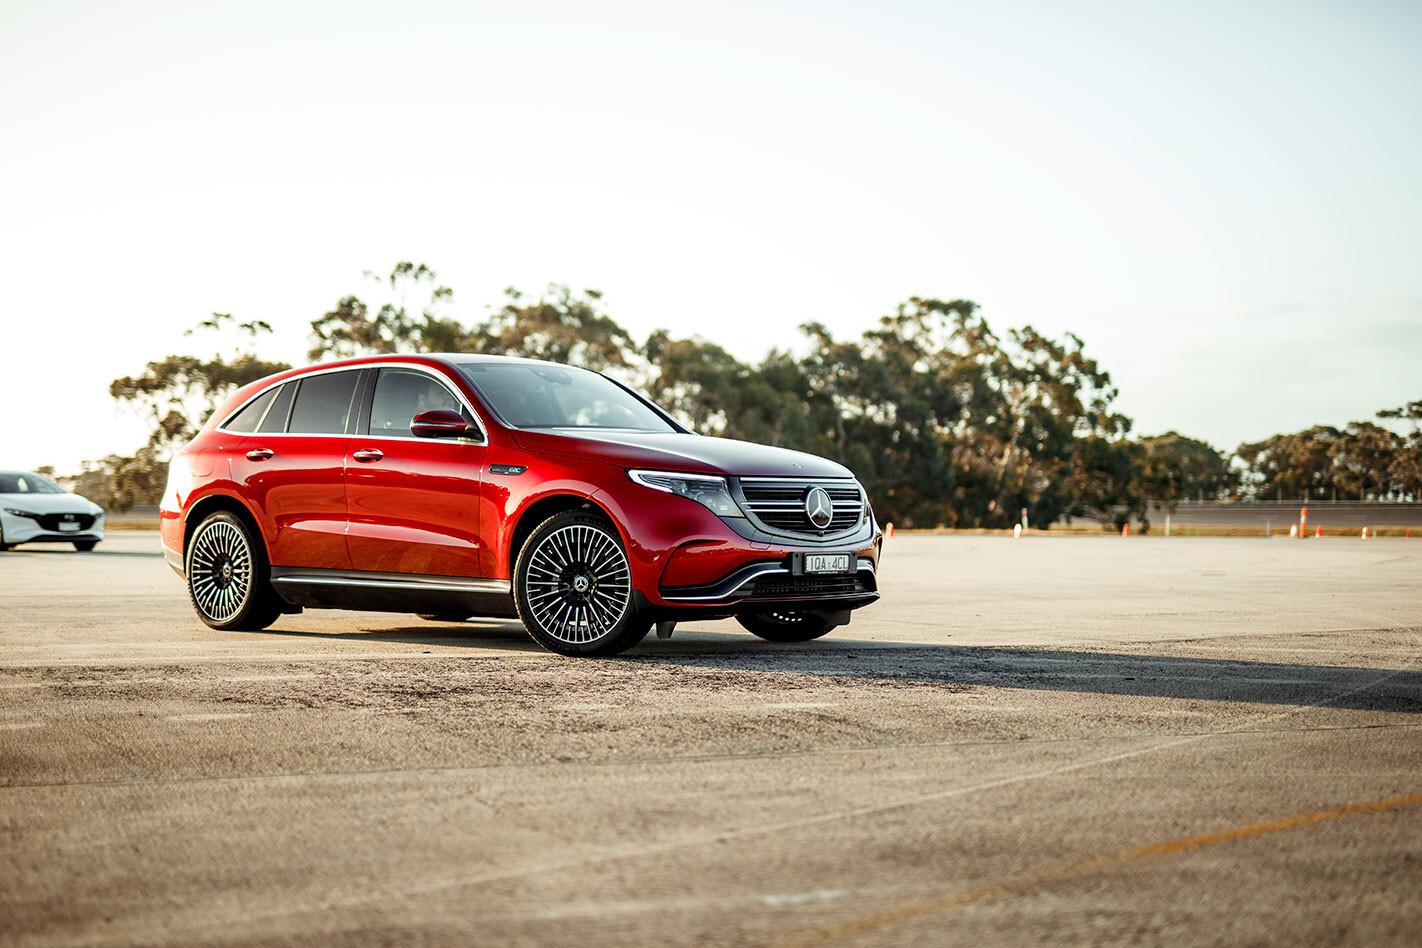 Mercedes-Benz - 2020 COTY Contender